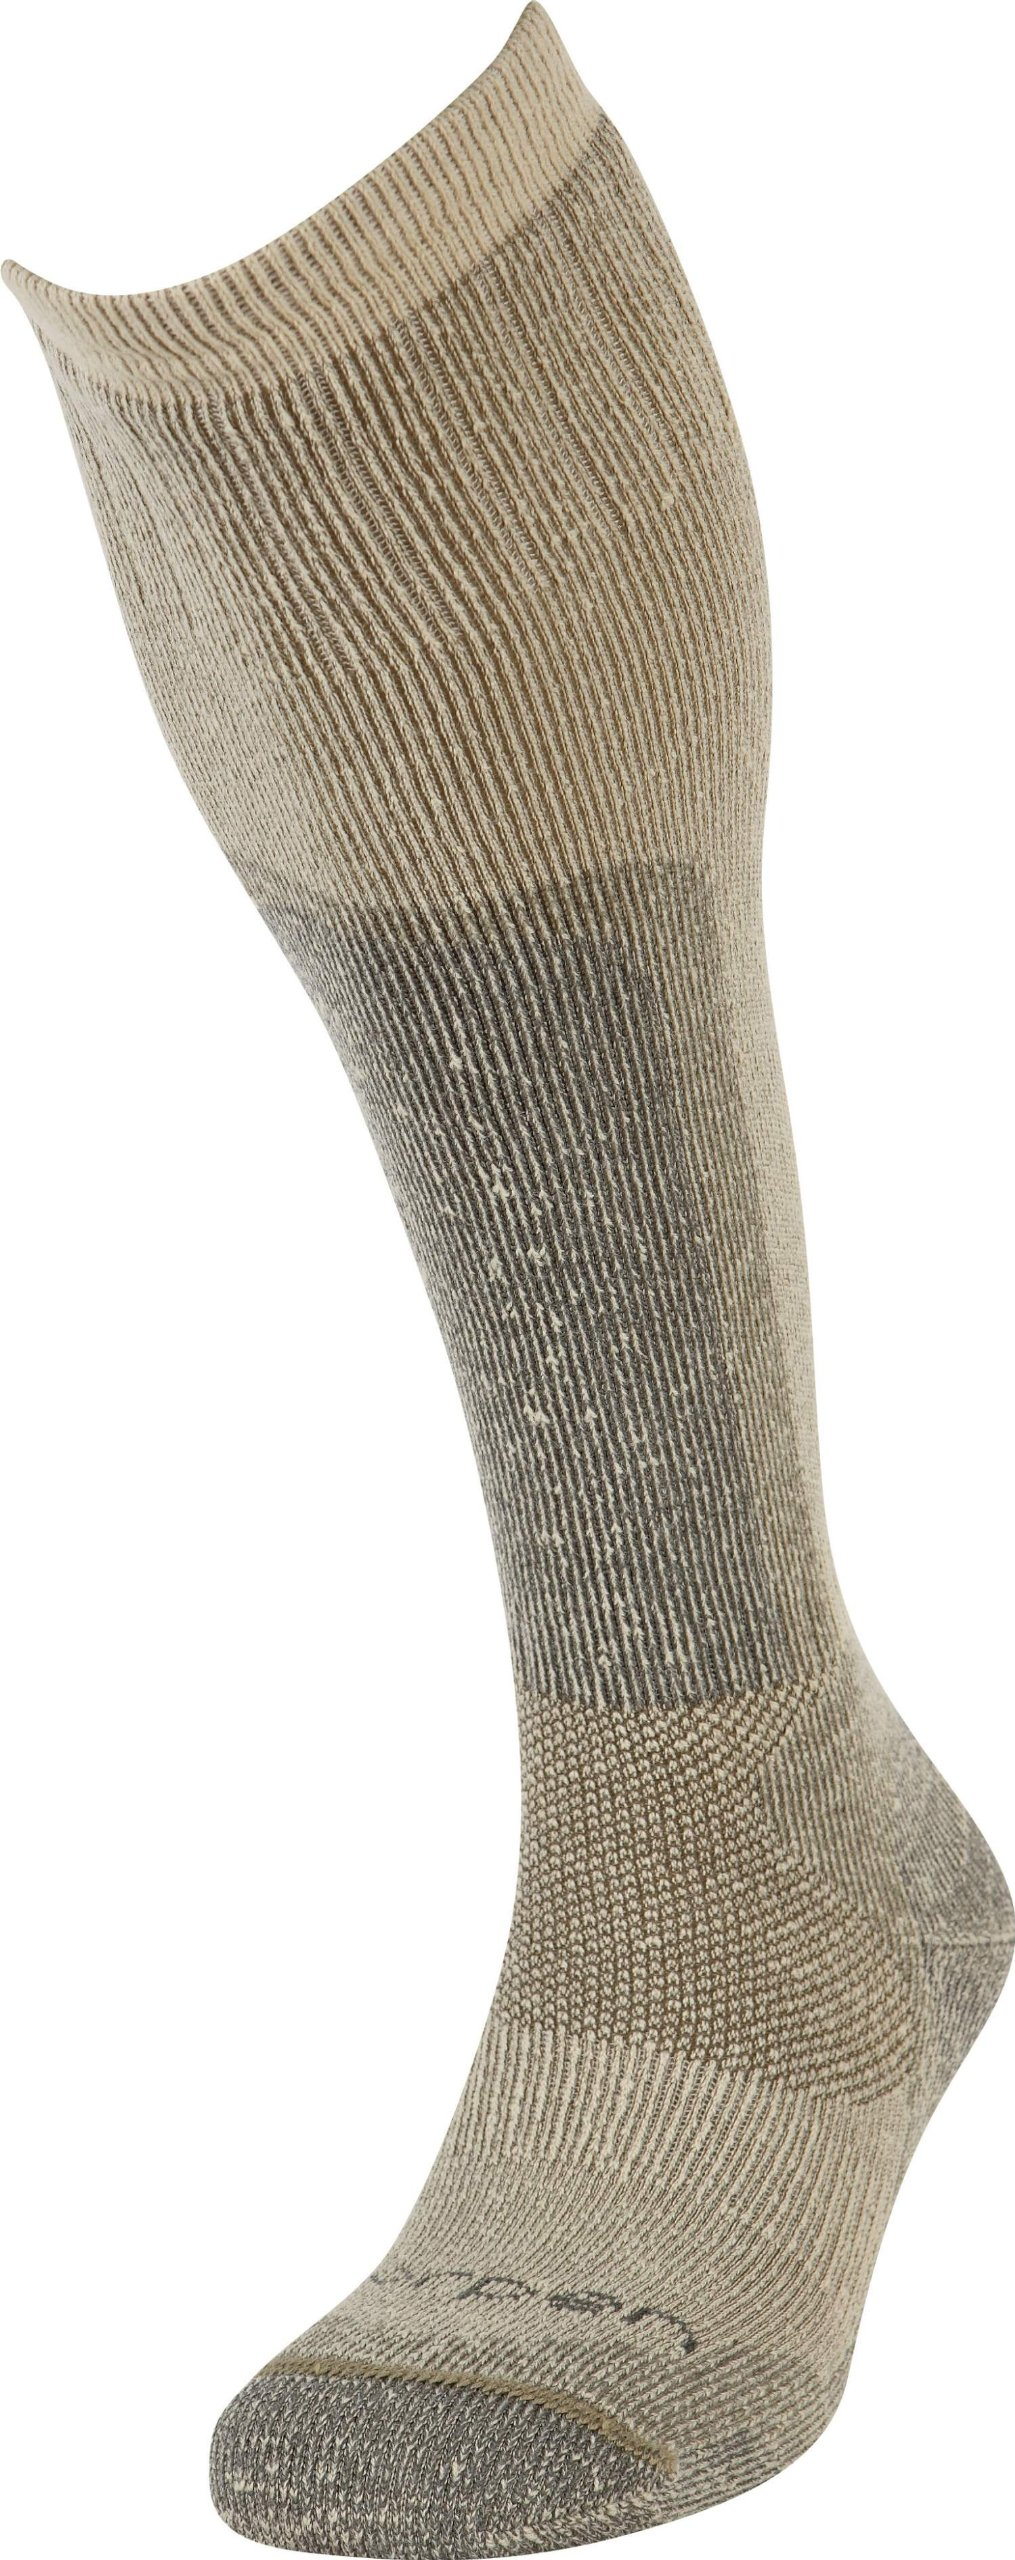 Lorpen Hunting Super Heavy Socks (Desert, Medium) by Lorpen